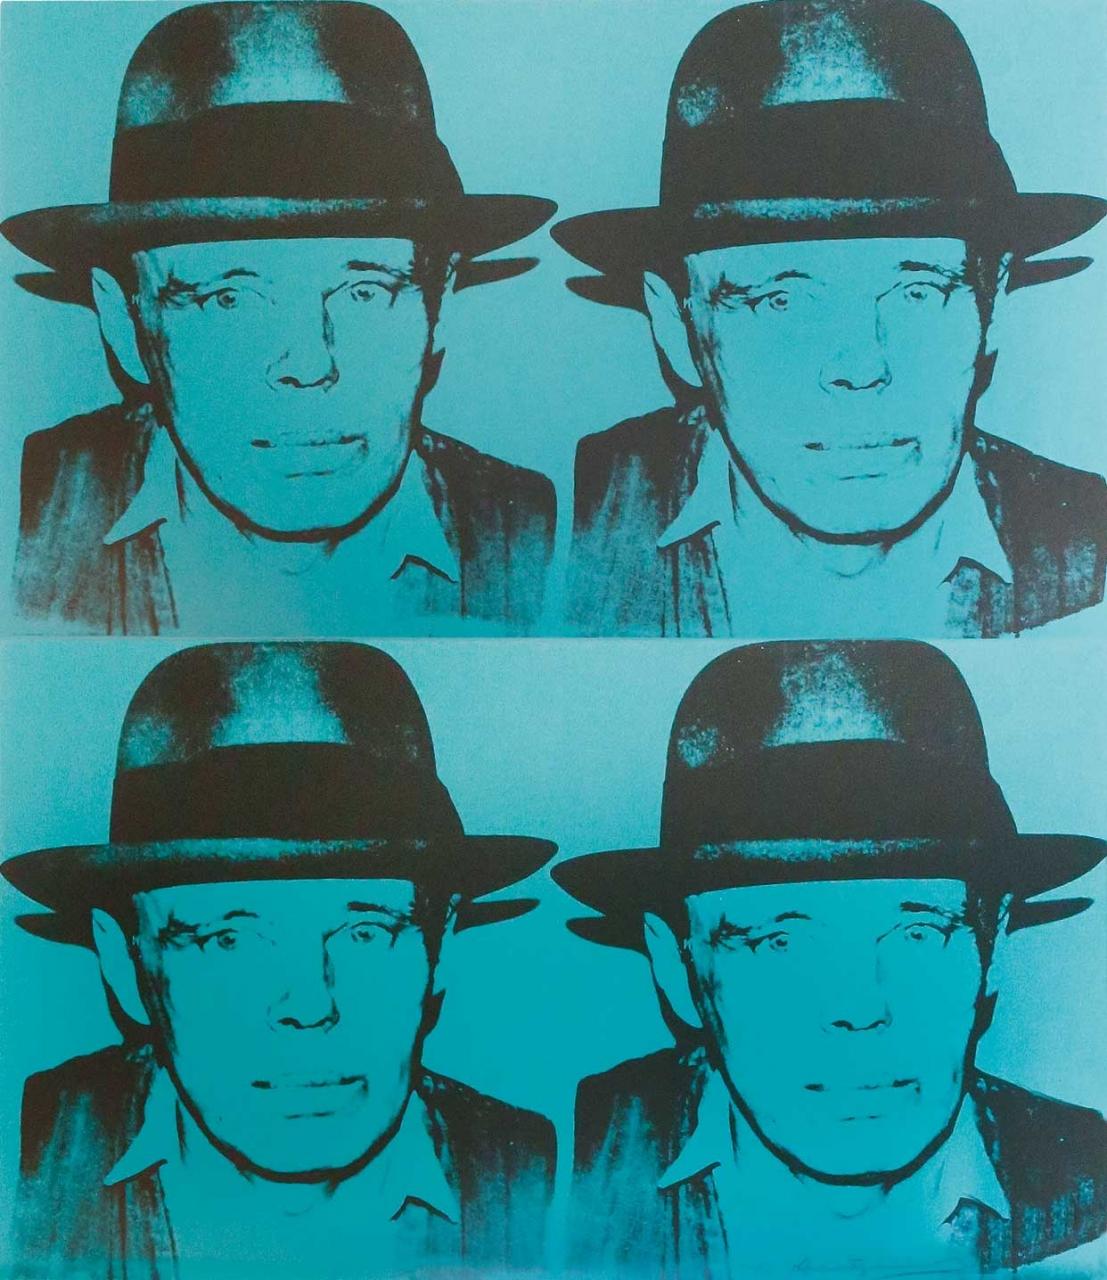 Andy Warhol: Joseph Beuys - State 1